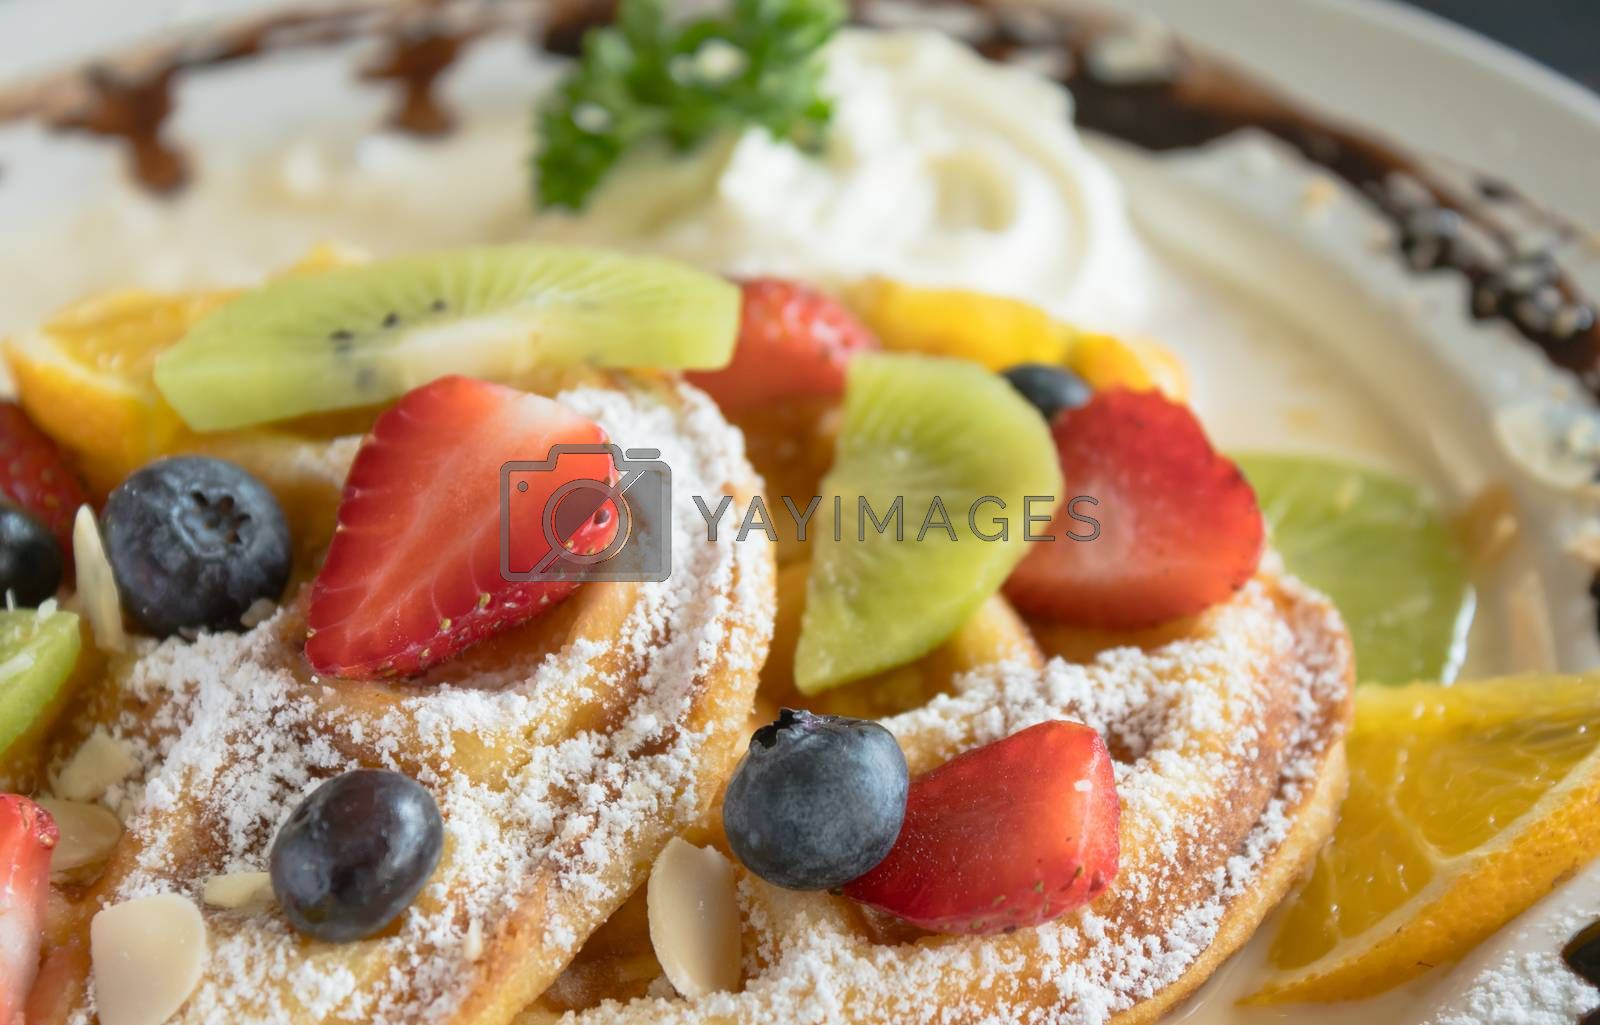 Strawberry Blueberry Kiwi Lemon Waffle Whipped Cream Chocolate Dessert. Fruity dessert food and drink category